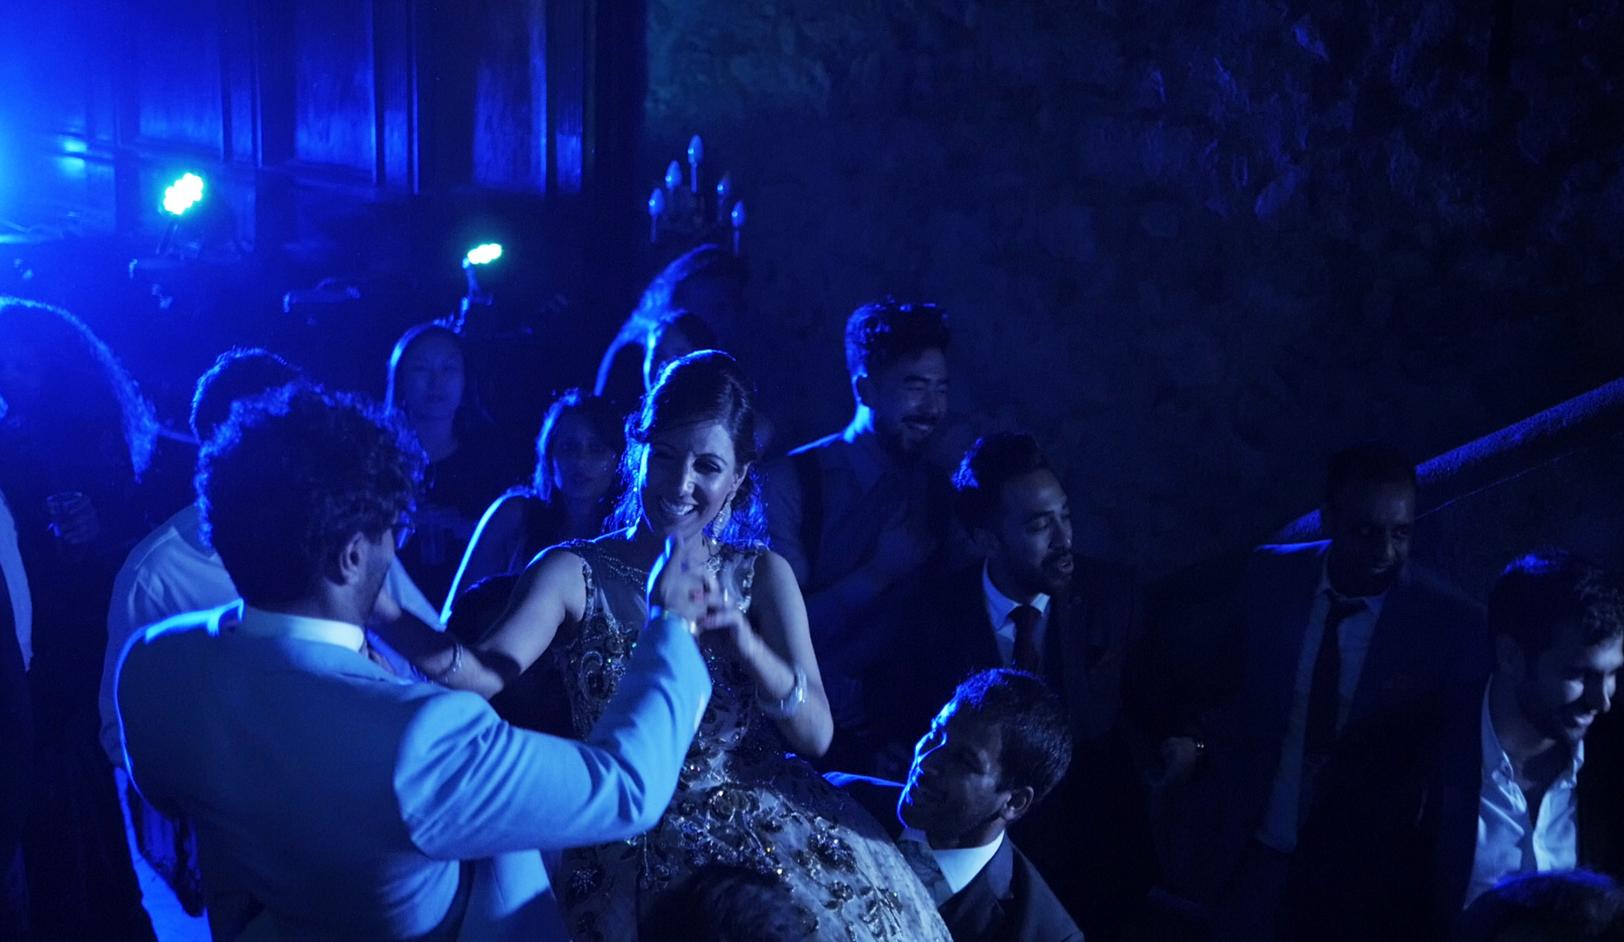 matrimonio-indiano-castello-medievale-castellammare-di-stabia-sorrento-video.jpg